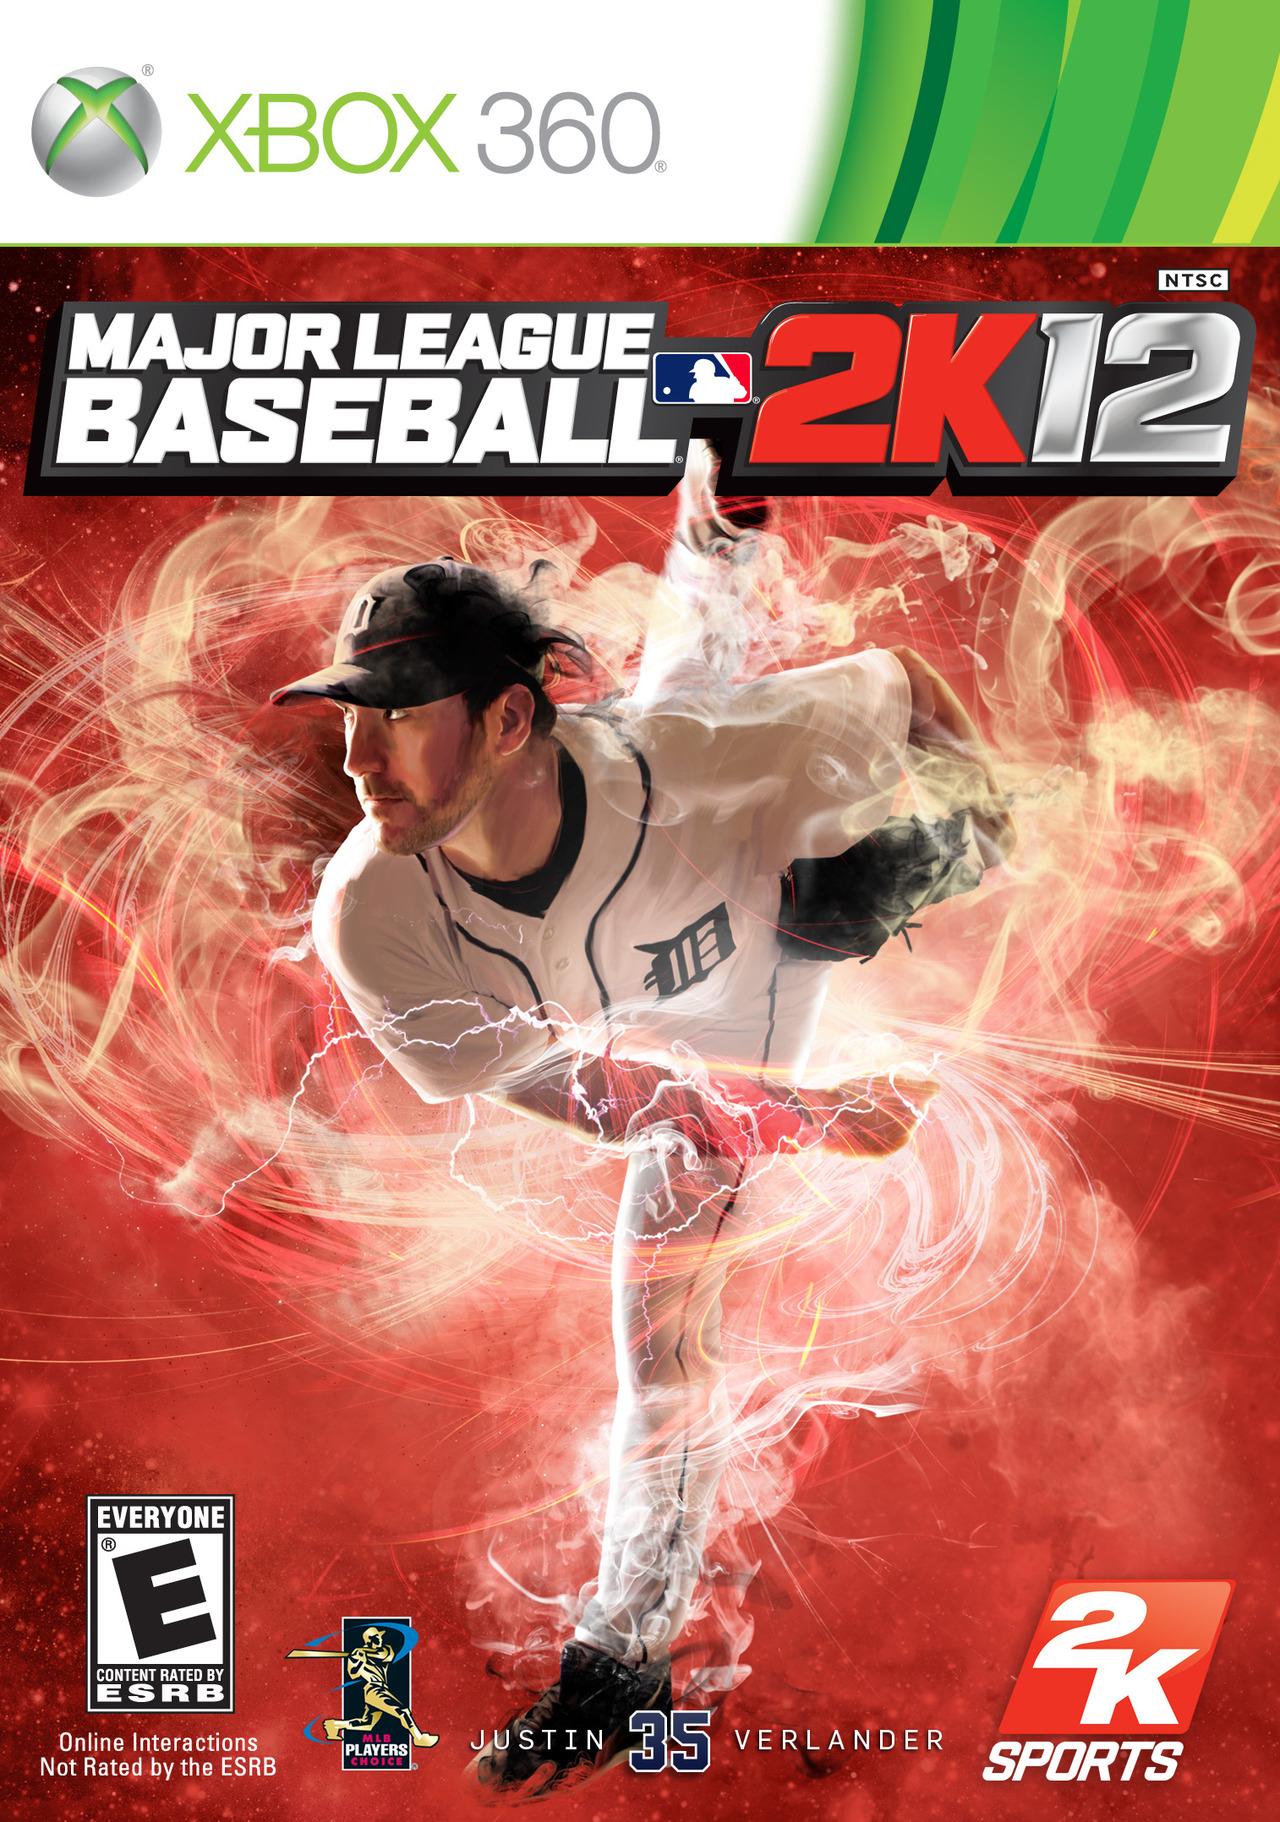 Major League Baseball 2K12 [XBOX] [UL]